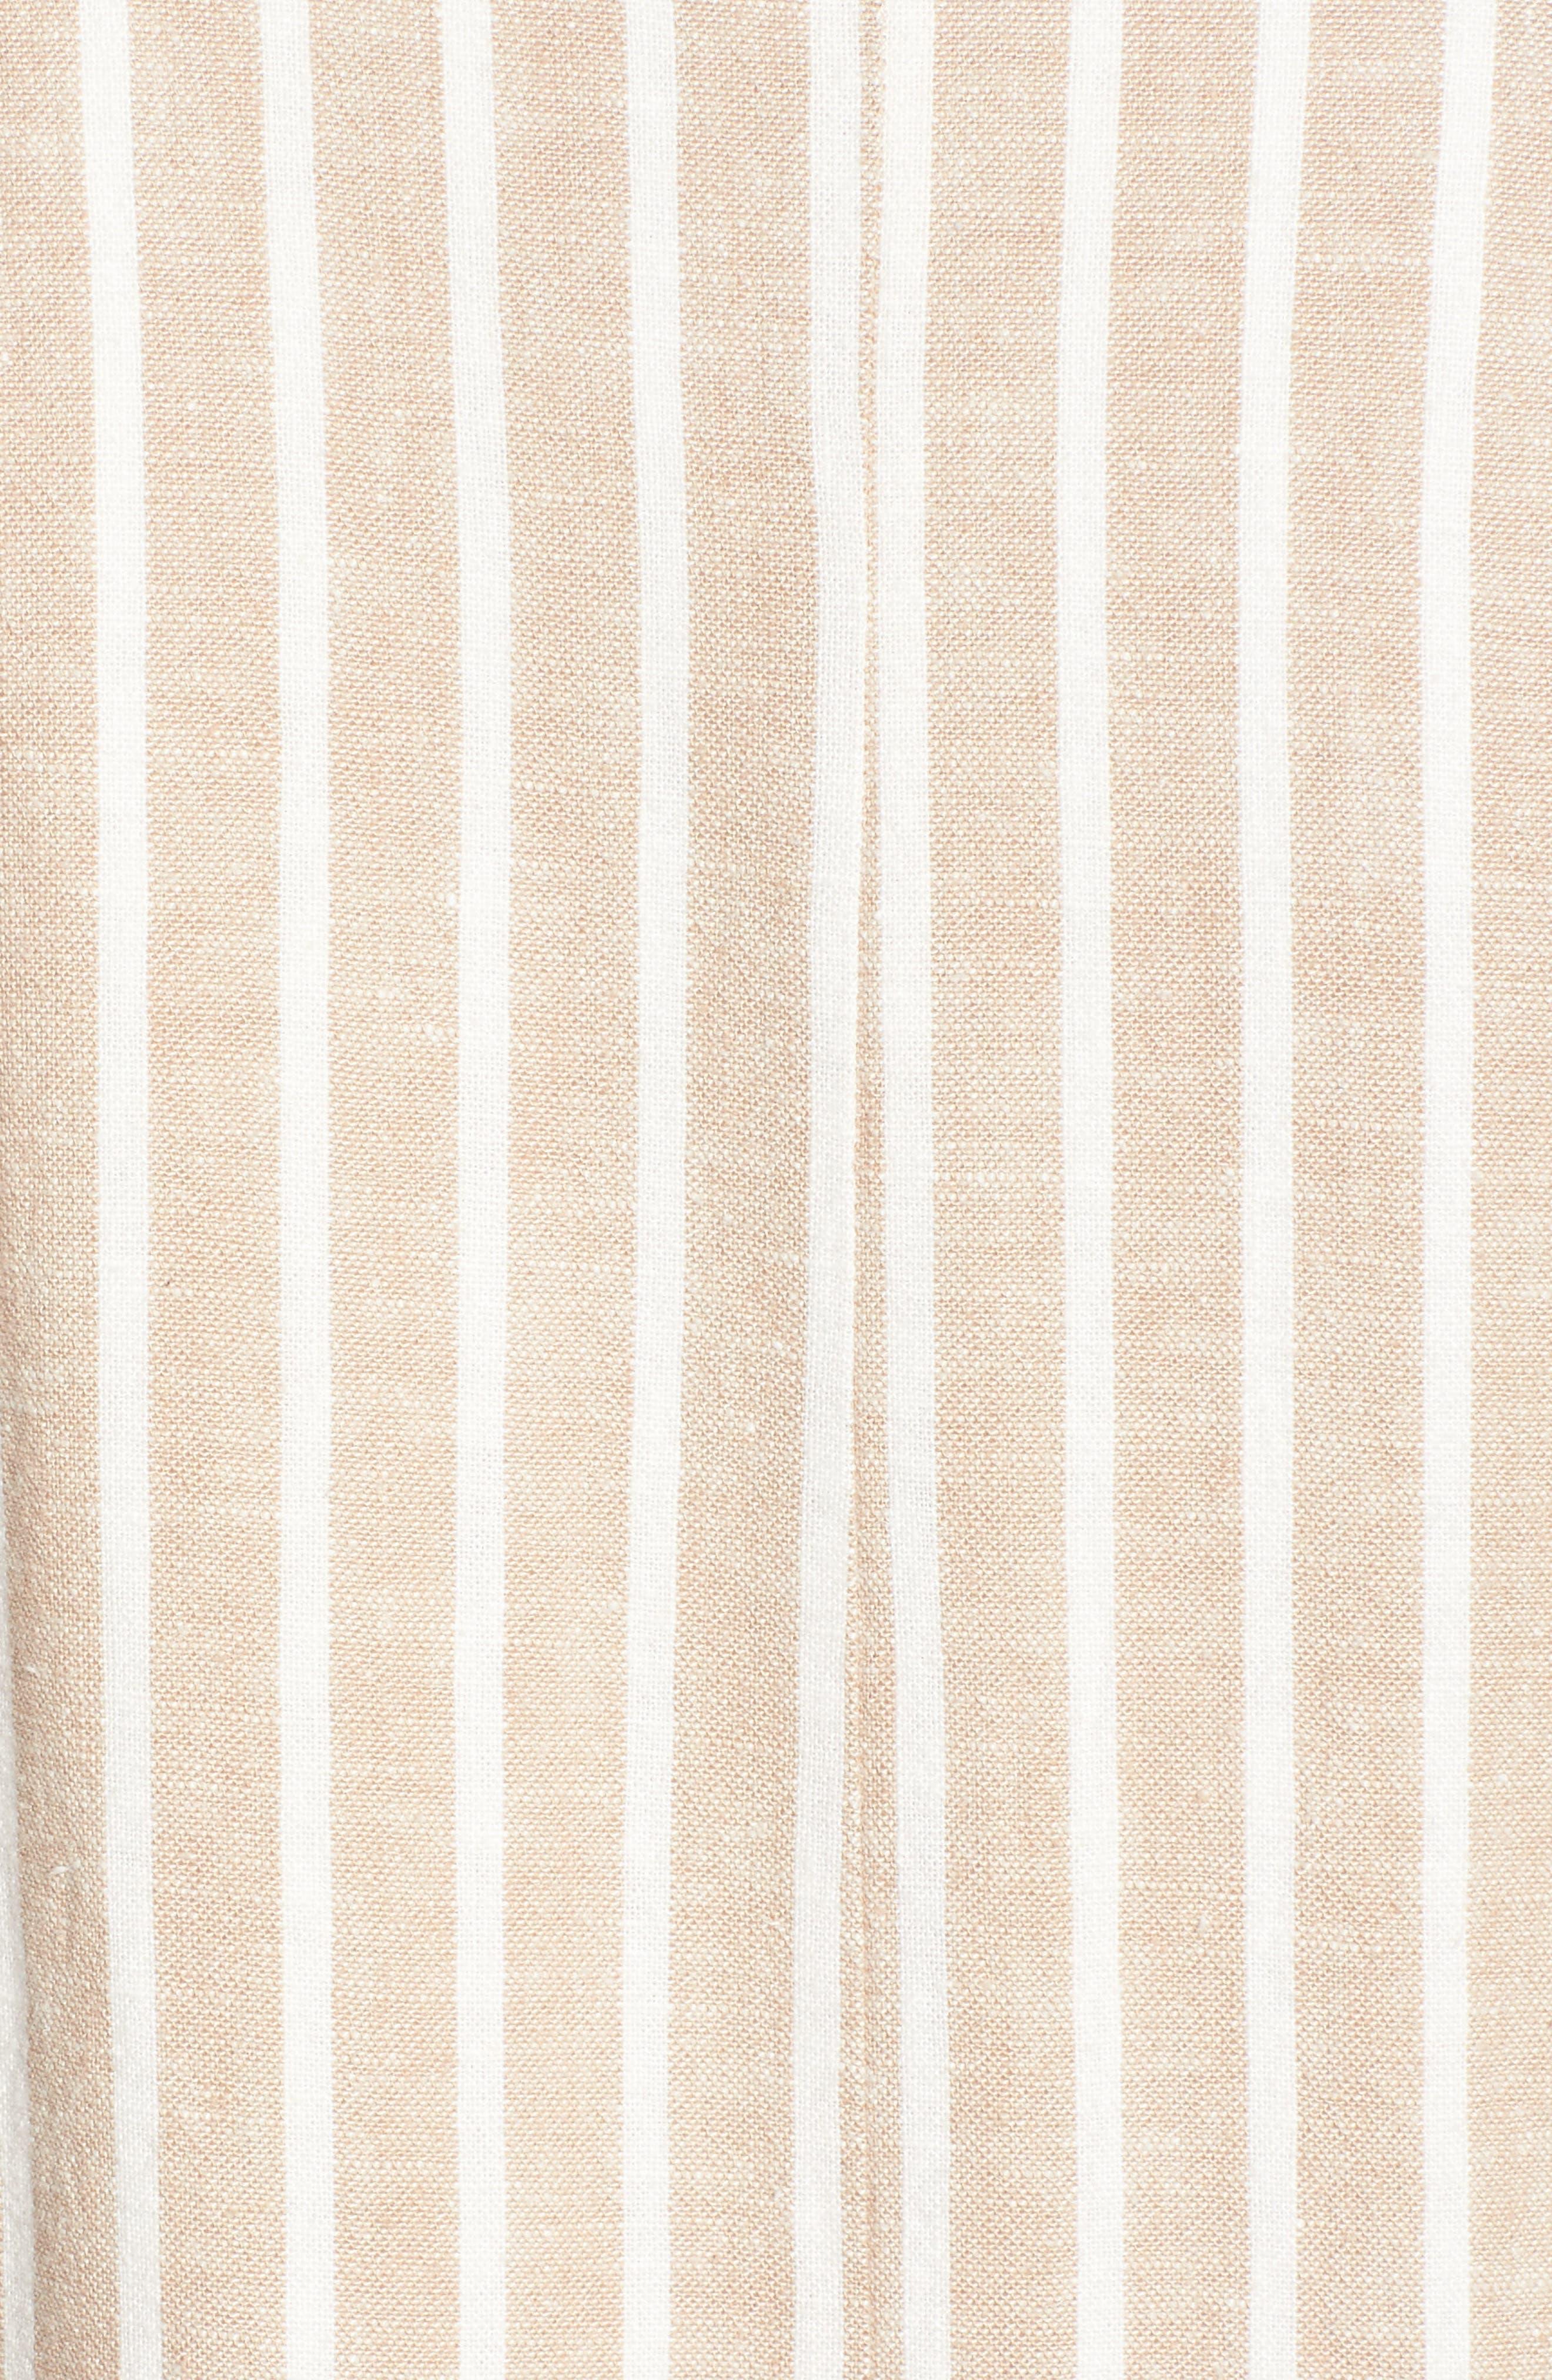 Cinch Sleeve Blazer,                             Alternate thumbnail 5, color,                             Tan Nomad Ella Linen Stripe